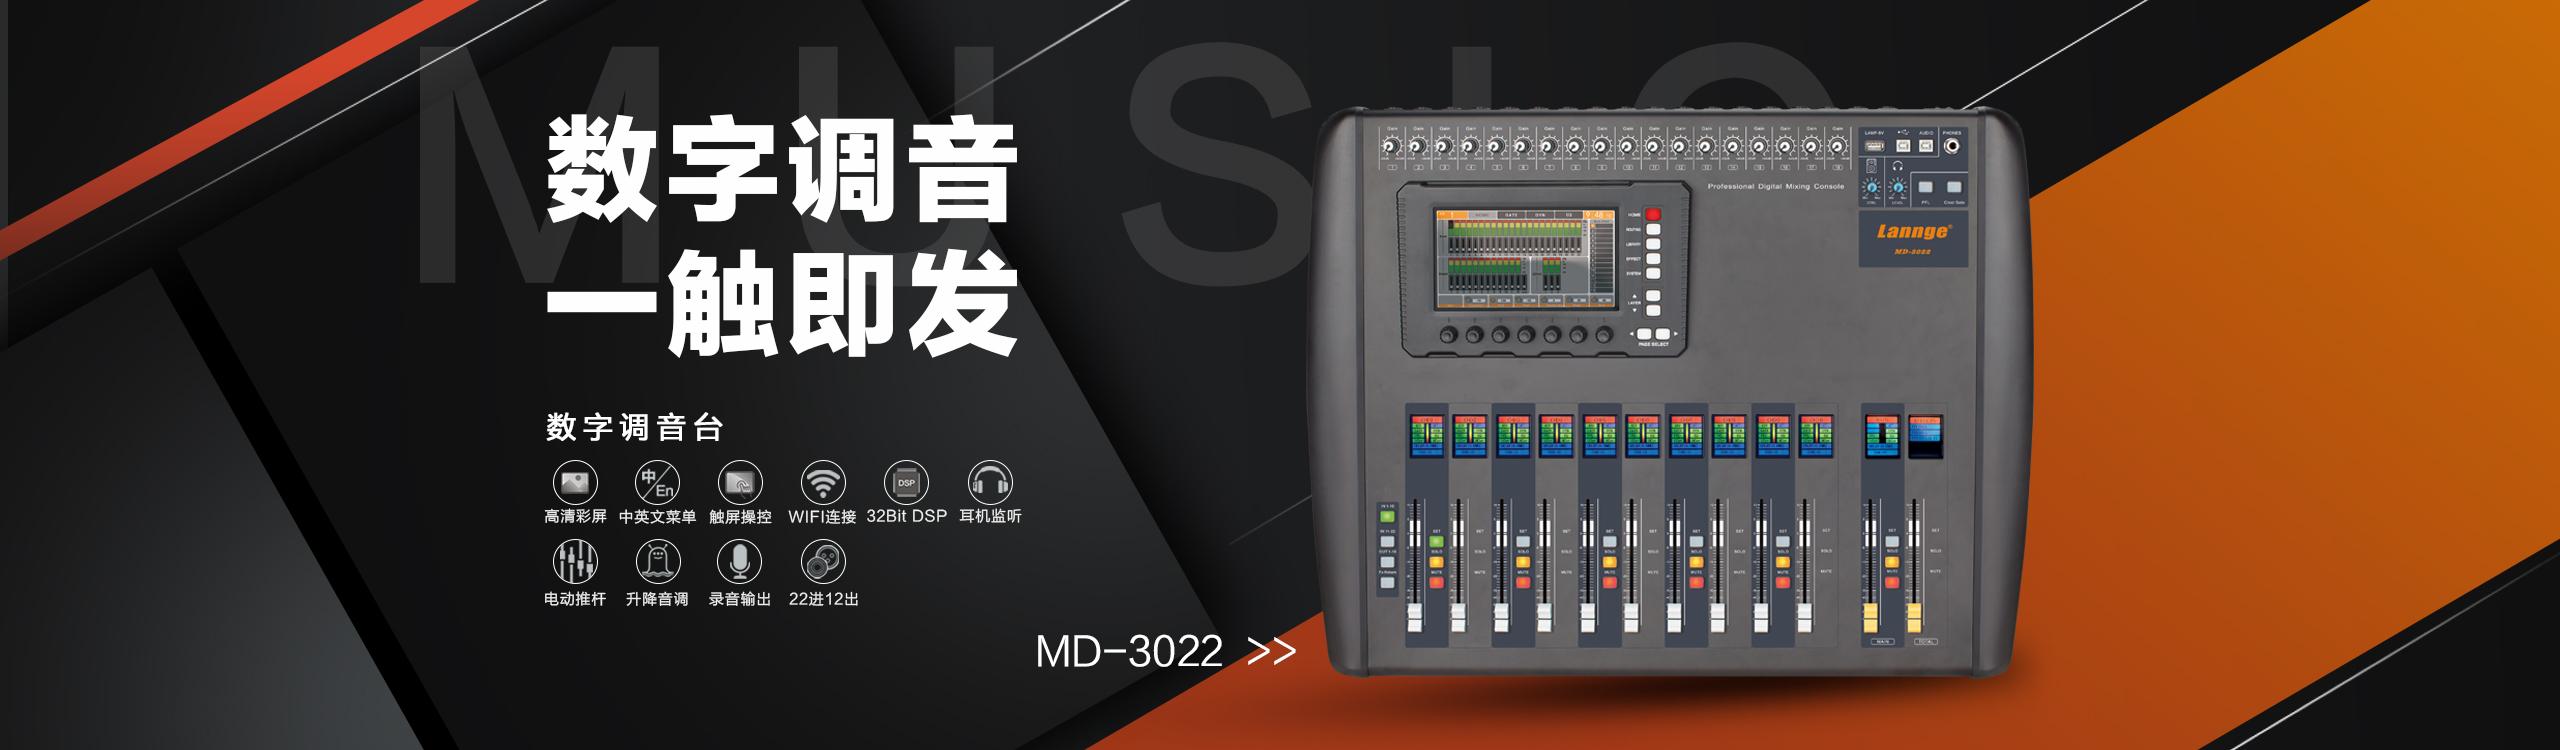 MD-3022